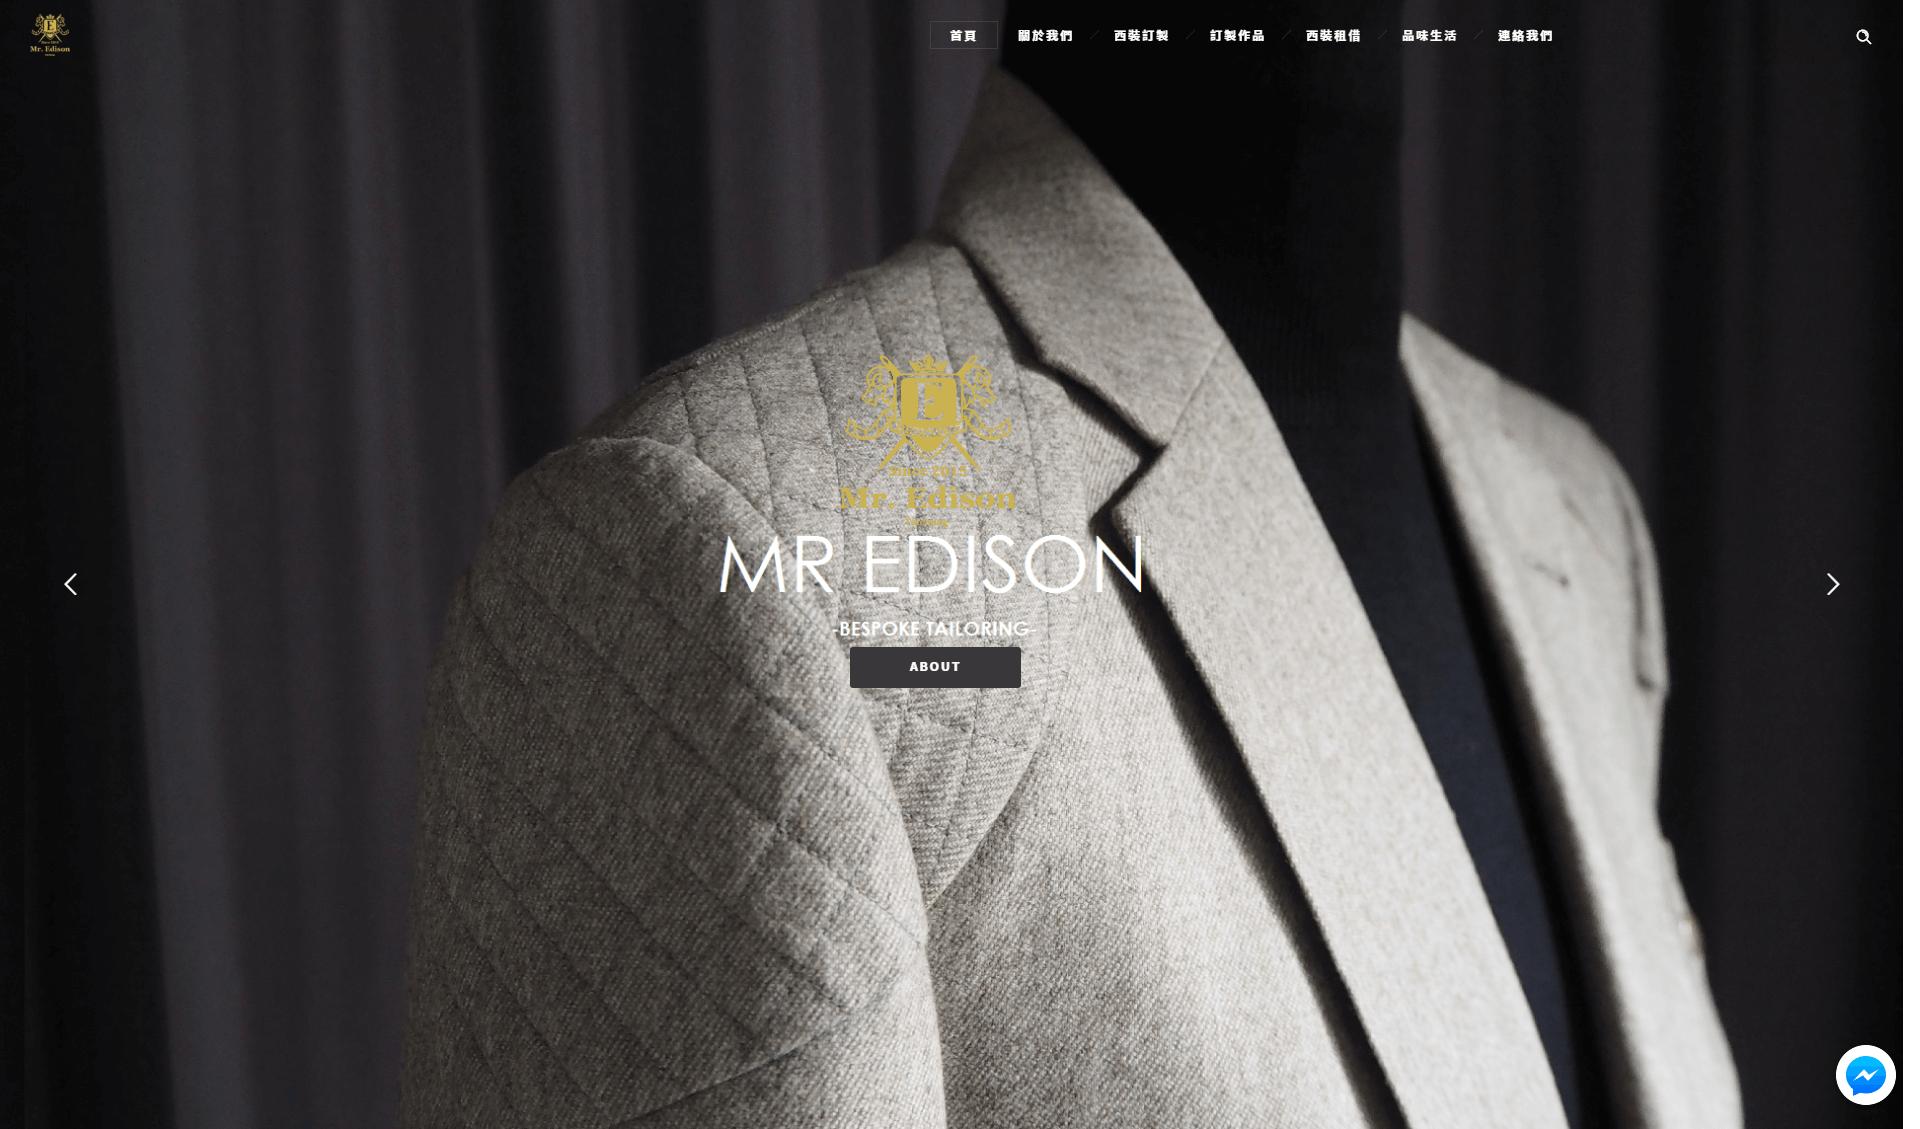 Mr.Edison Suit 西裝訂製 - SEO 優化   網站設計   網站架設